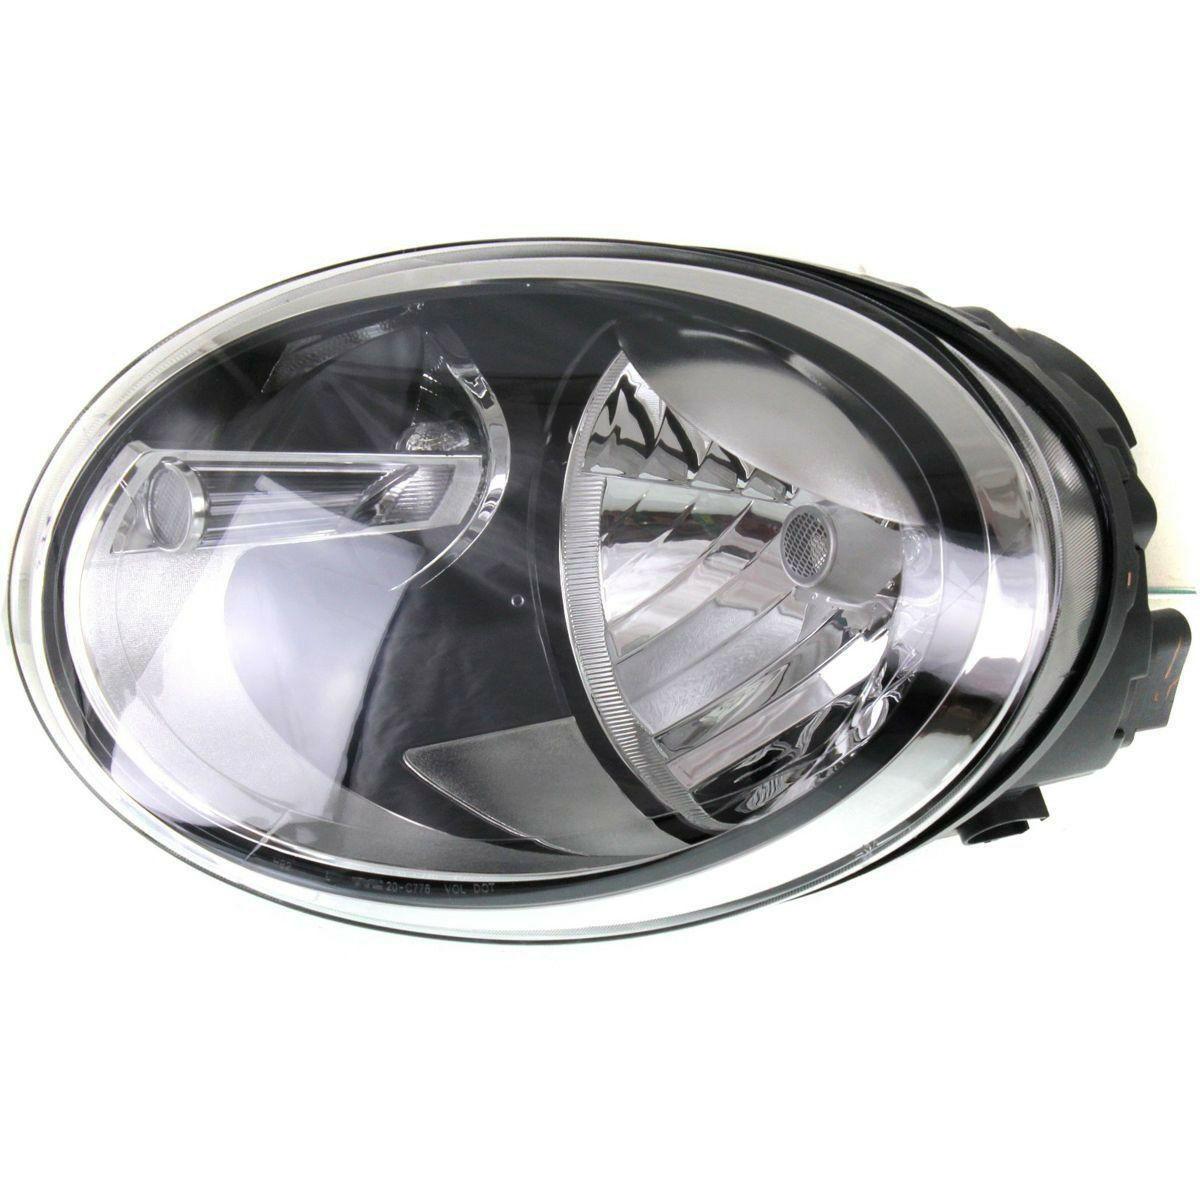 NEW HALOGEN HEAD LAMP ASSEMBLY DRIVER SIDE FITS VOLKSWAGEN BEETLE VW2502106